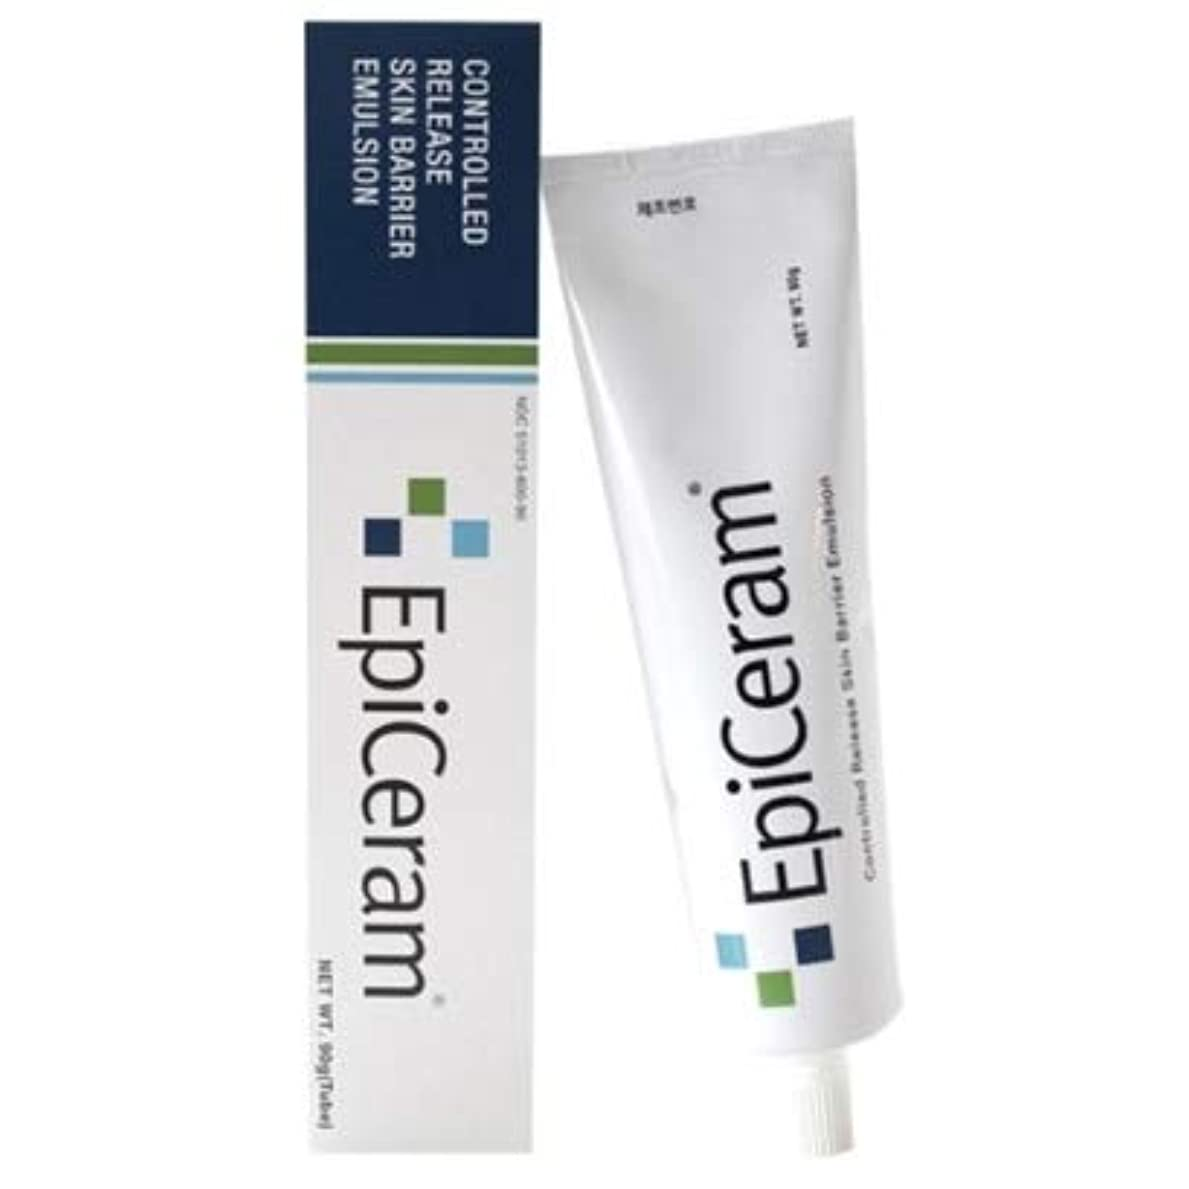 [Epiceram]日本発売記念セール(1000円割)! [ 非ステロイド/安全なアトピー1次治療剤-米FDA承認 ] Epiceram エッピセラム 90g. Skin Barrier Emulsion. X Mask Pack 2p